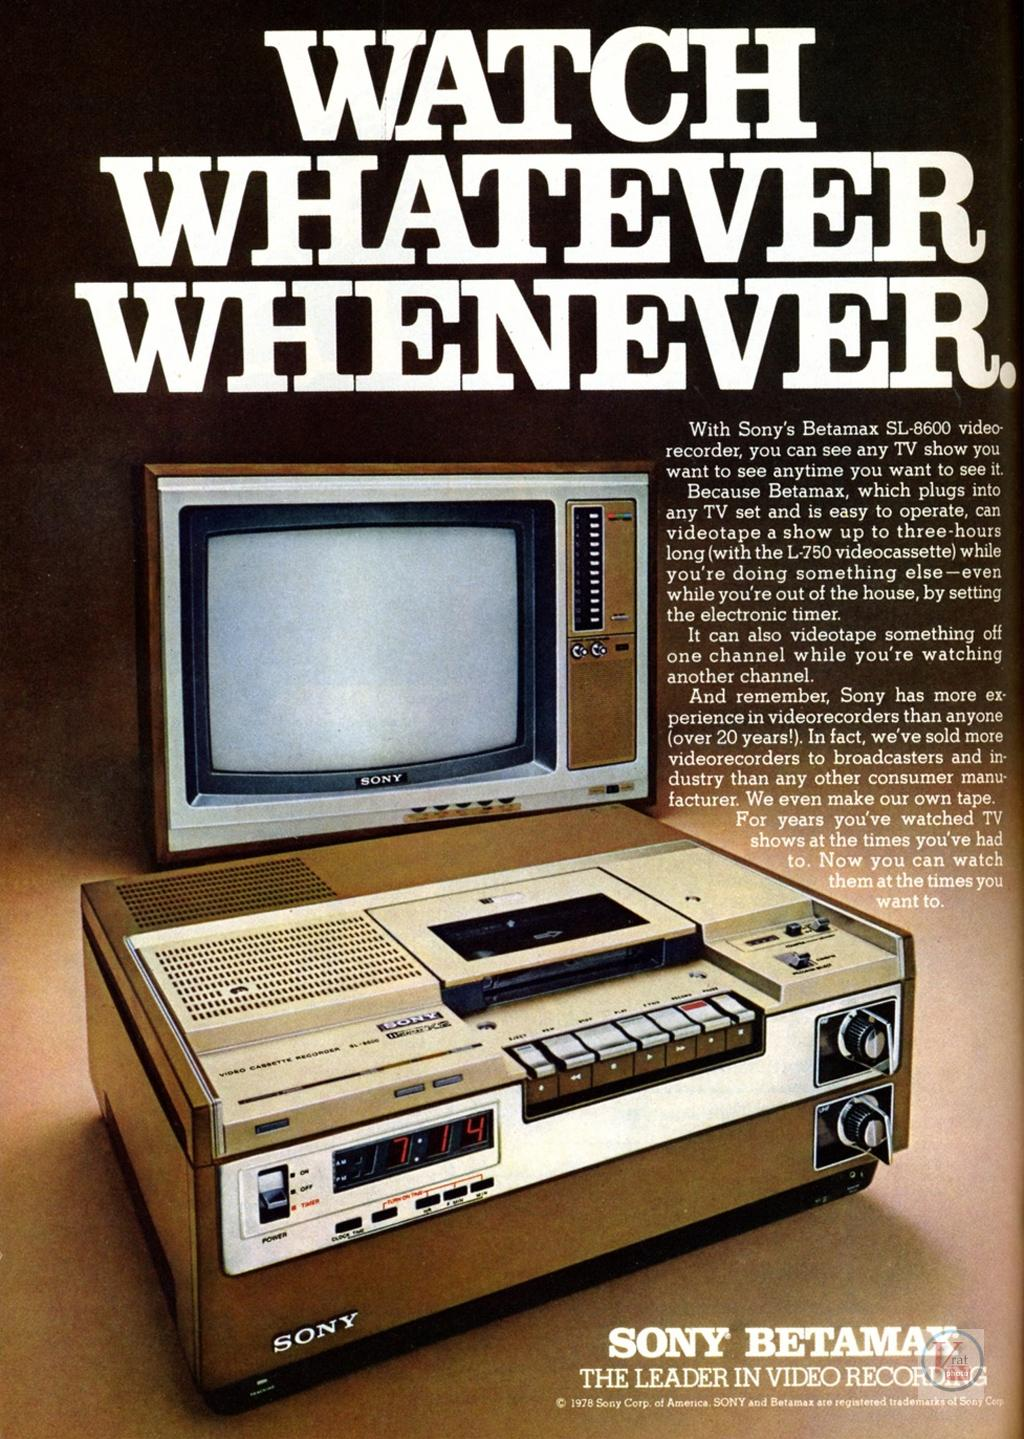 Sony Betamax VCR 1